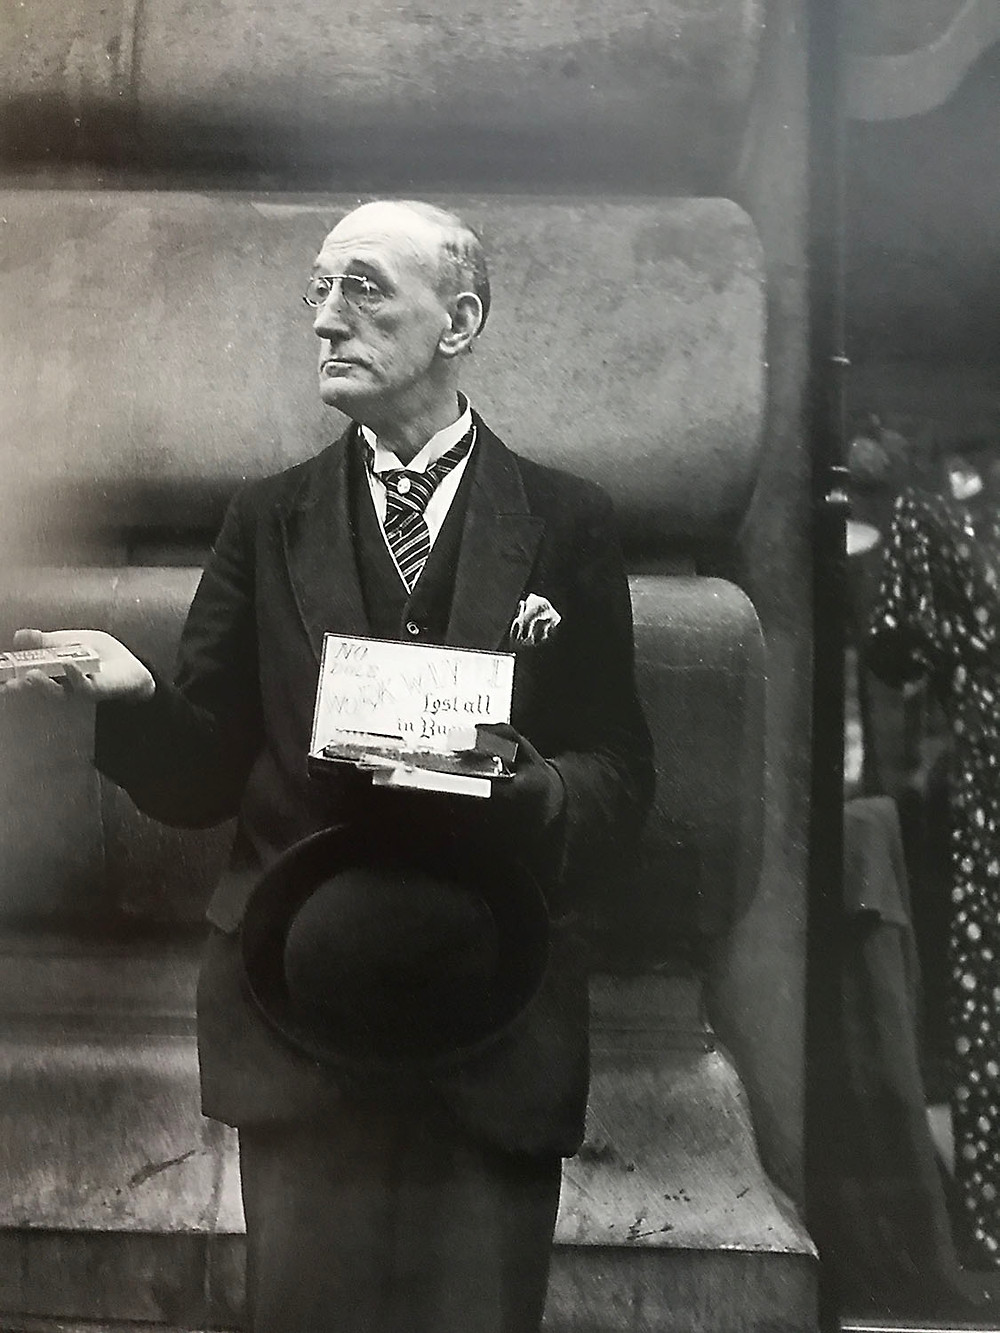 Niente elemosina, voglio un lavoro 1934, fotografia di Dora Maar